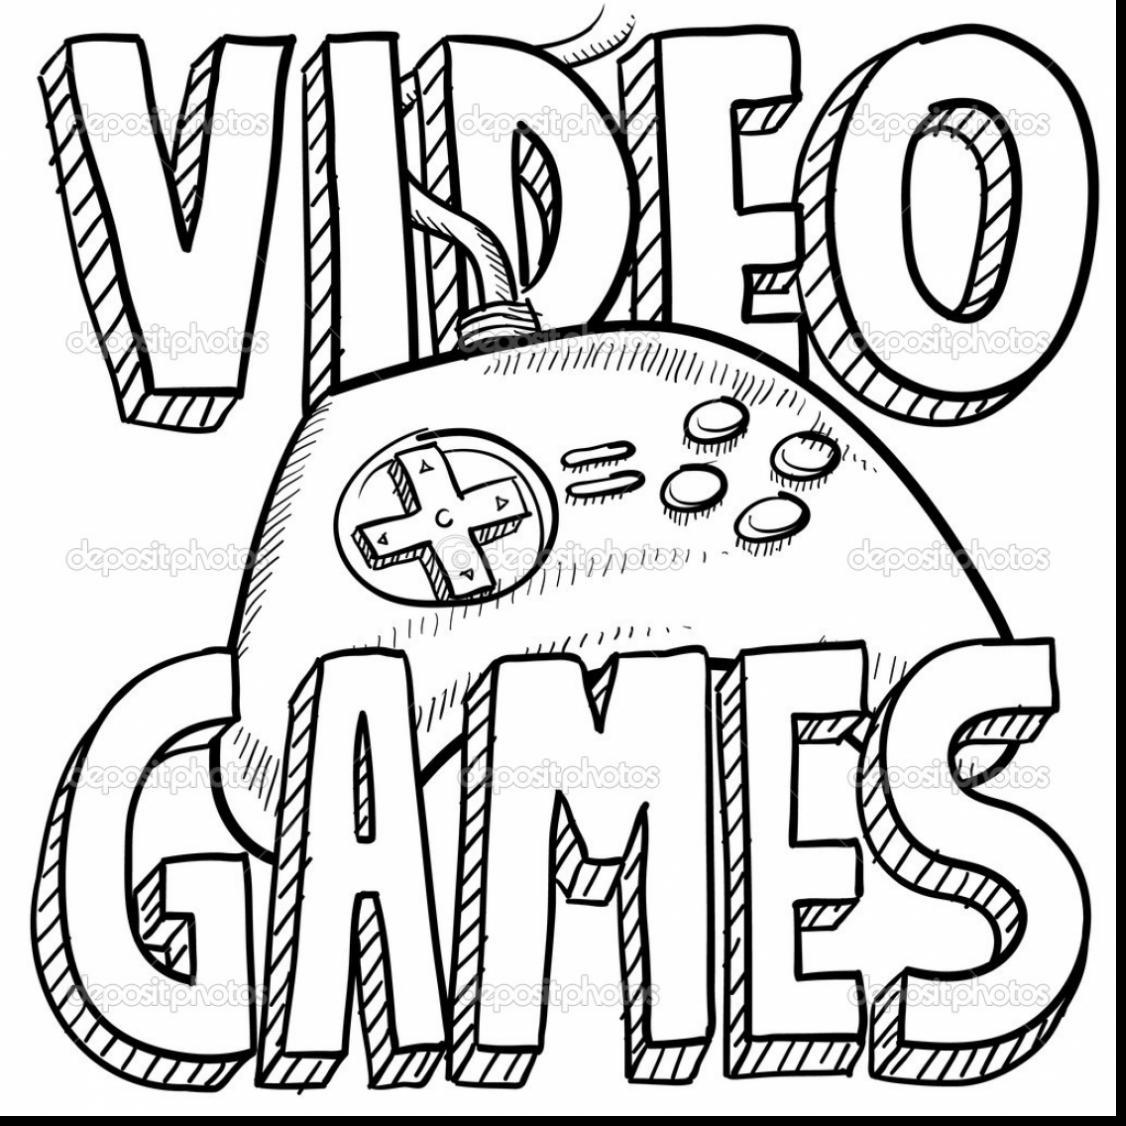 Free Games Drawing At Getdrawings